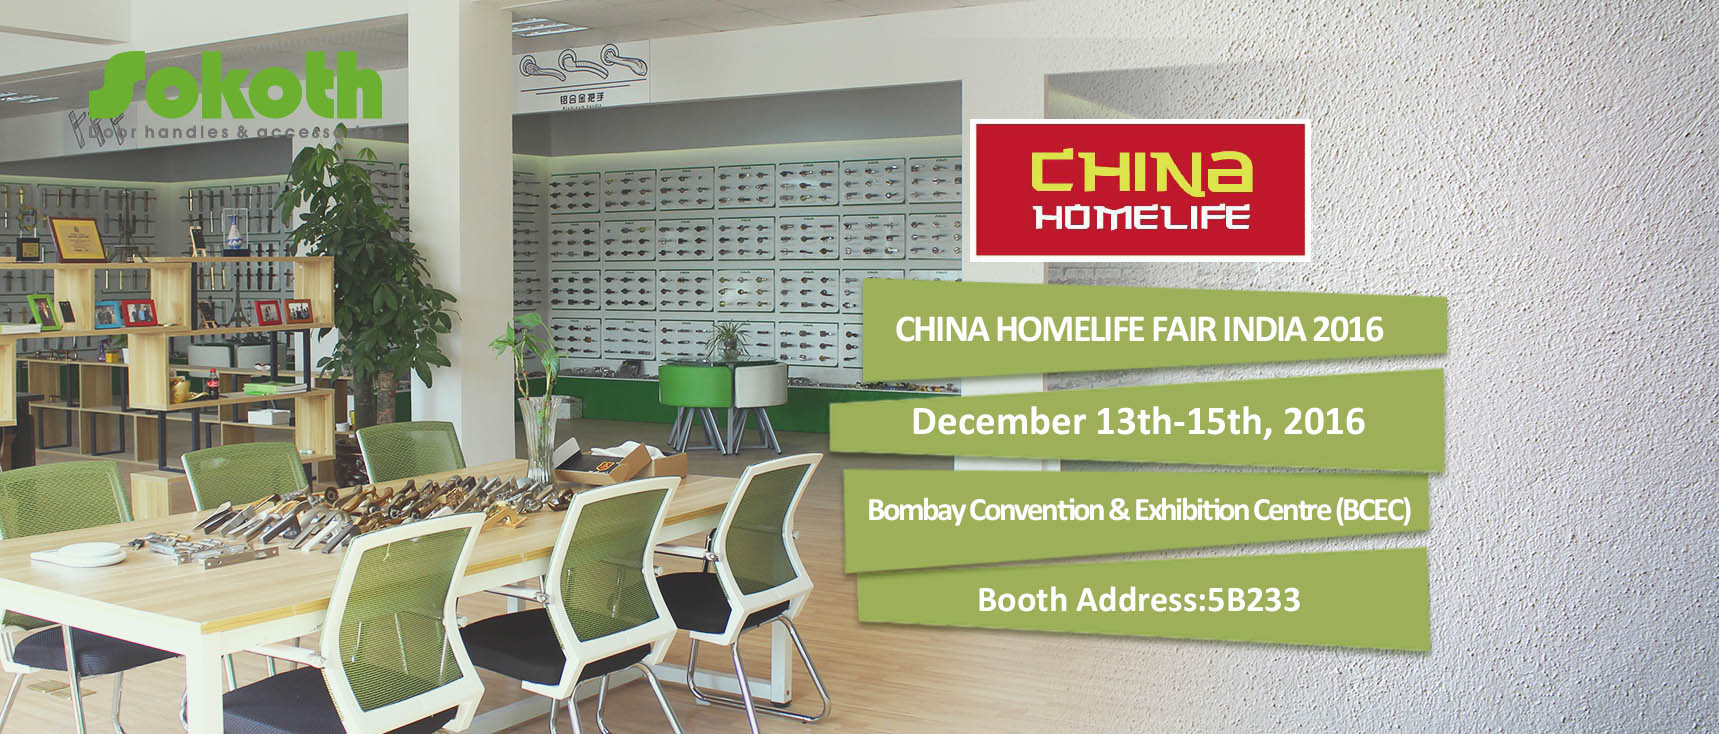 CHINA HOMELIFE FAIR INDIA 2016